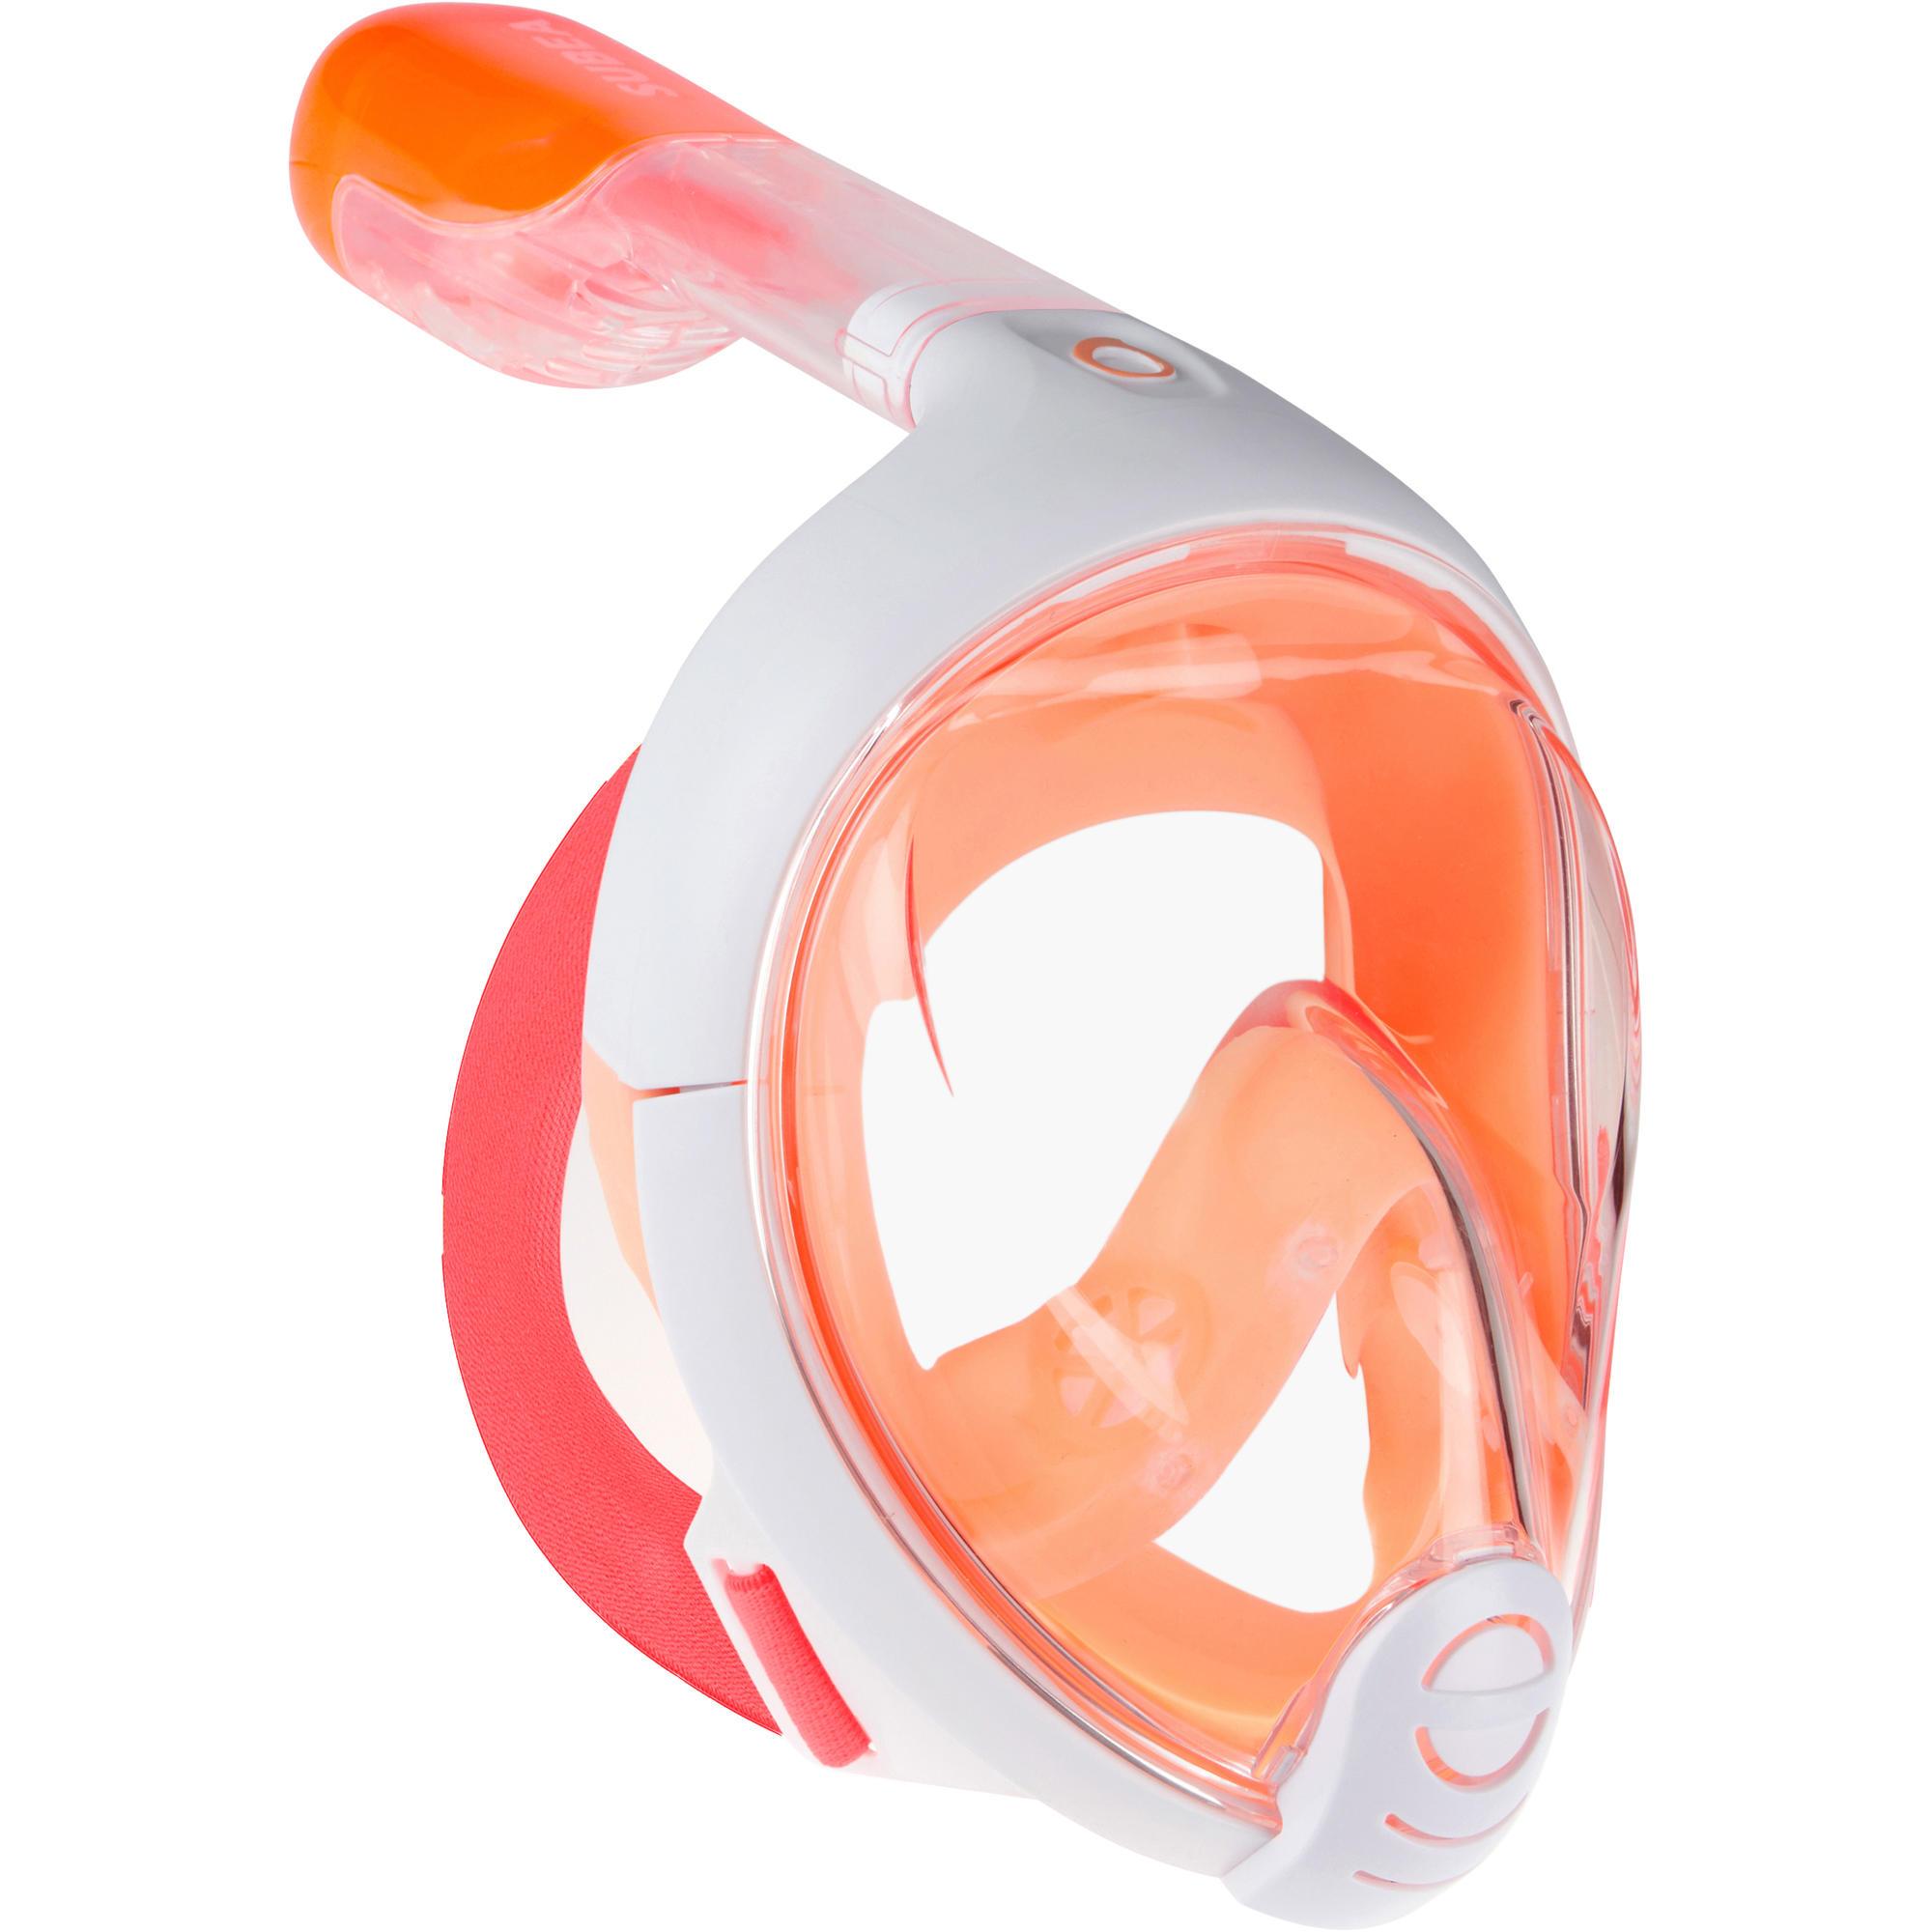 respiration mask for kids